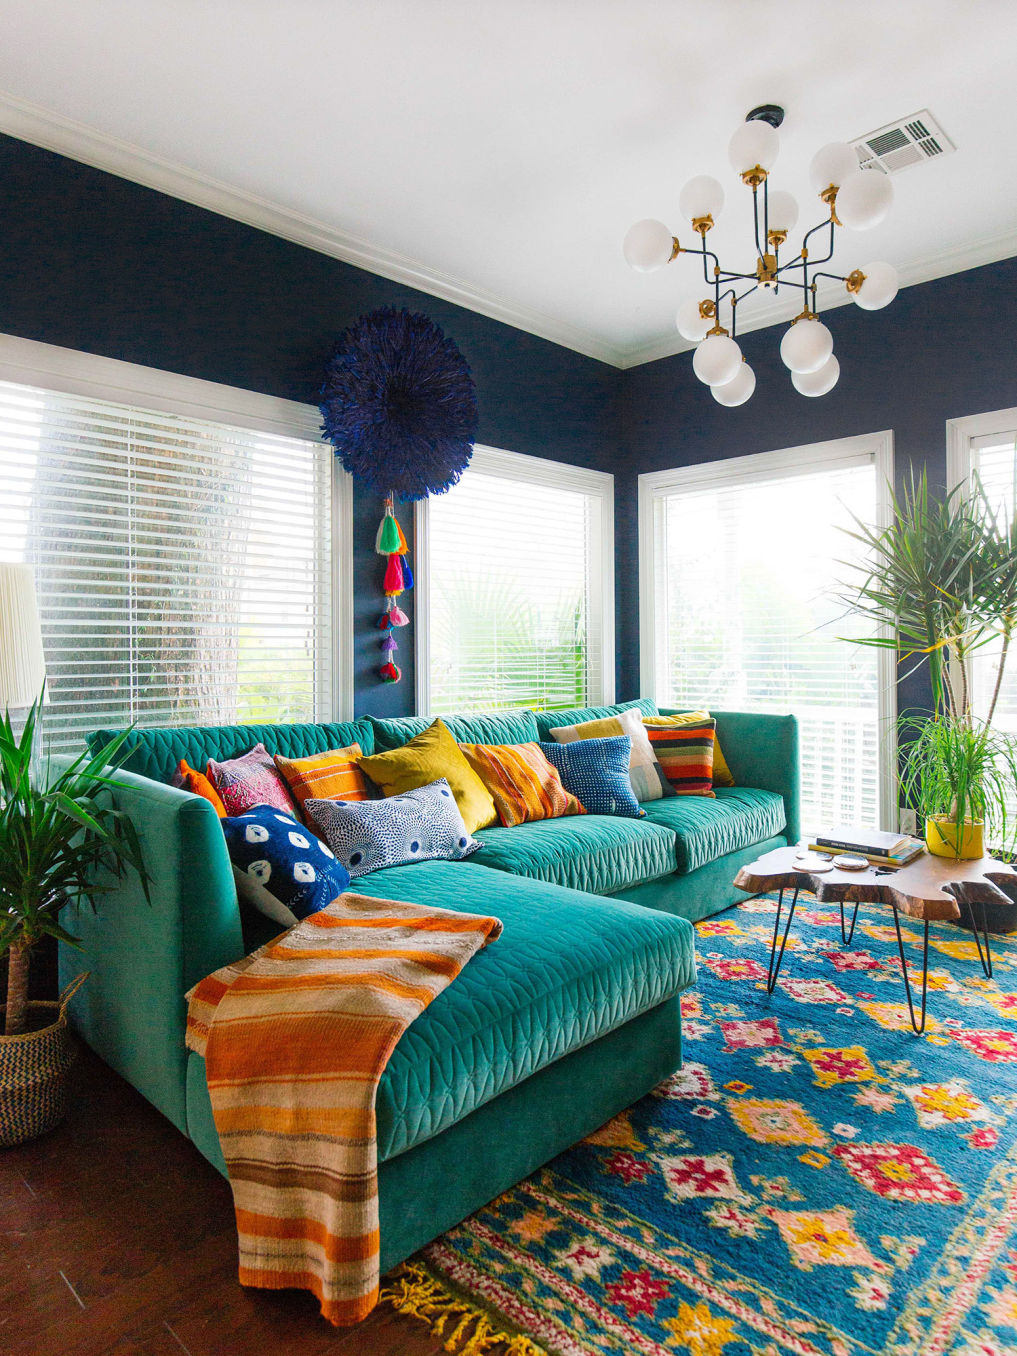 Navy blue walls and a green velvet sofa make this small room such a cozy space #blue #navyblue #naval #bohodecor #eclecticdecor #cozydecor #cozy #colorful #colorlover #bohodecor #vintagemodern #sunroom